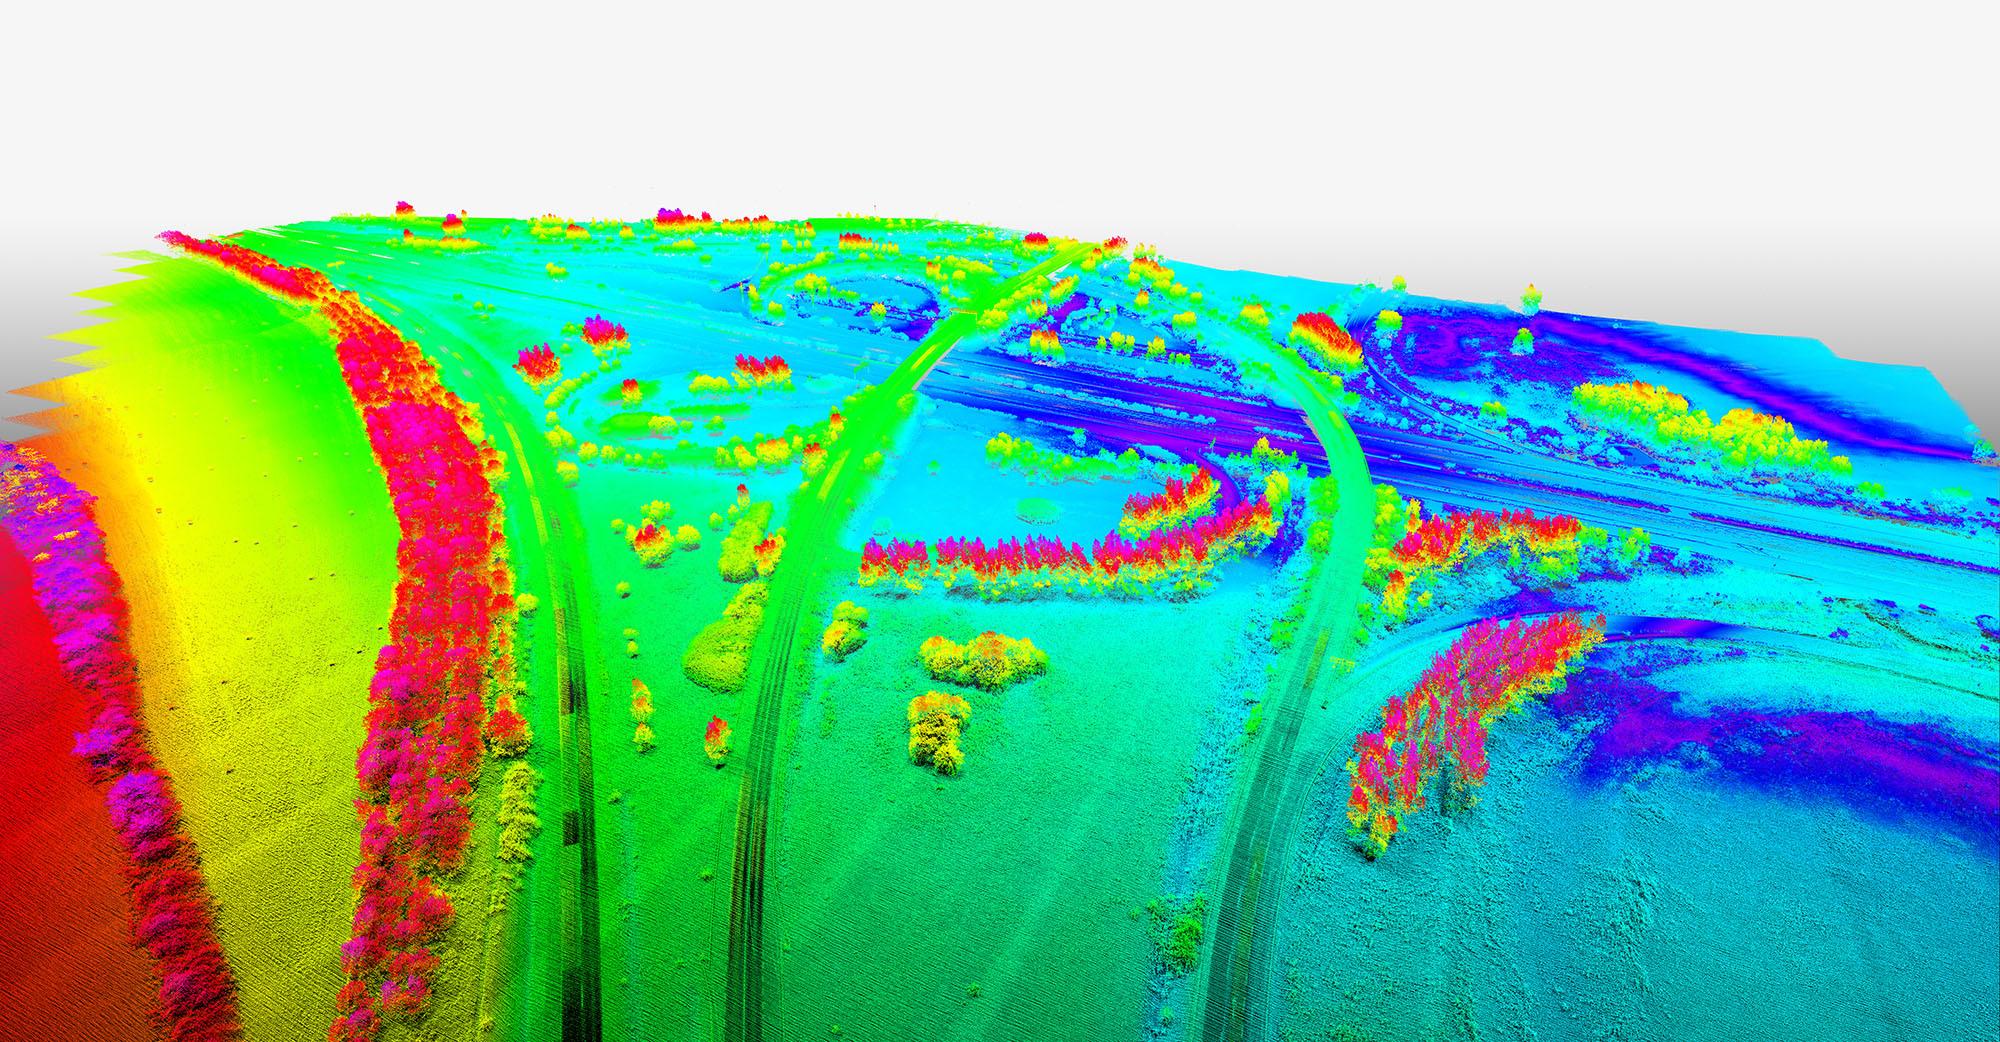 Velodyne Lidar and YellowScan Lead Drone Surveying Market